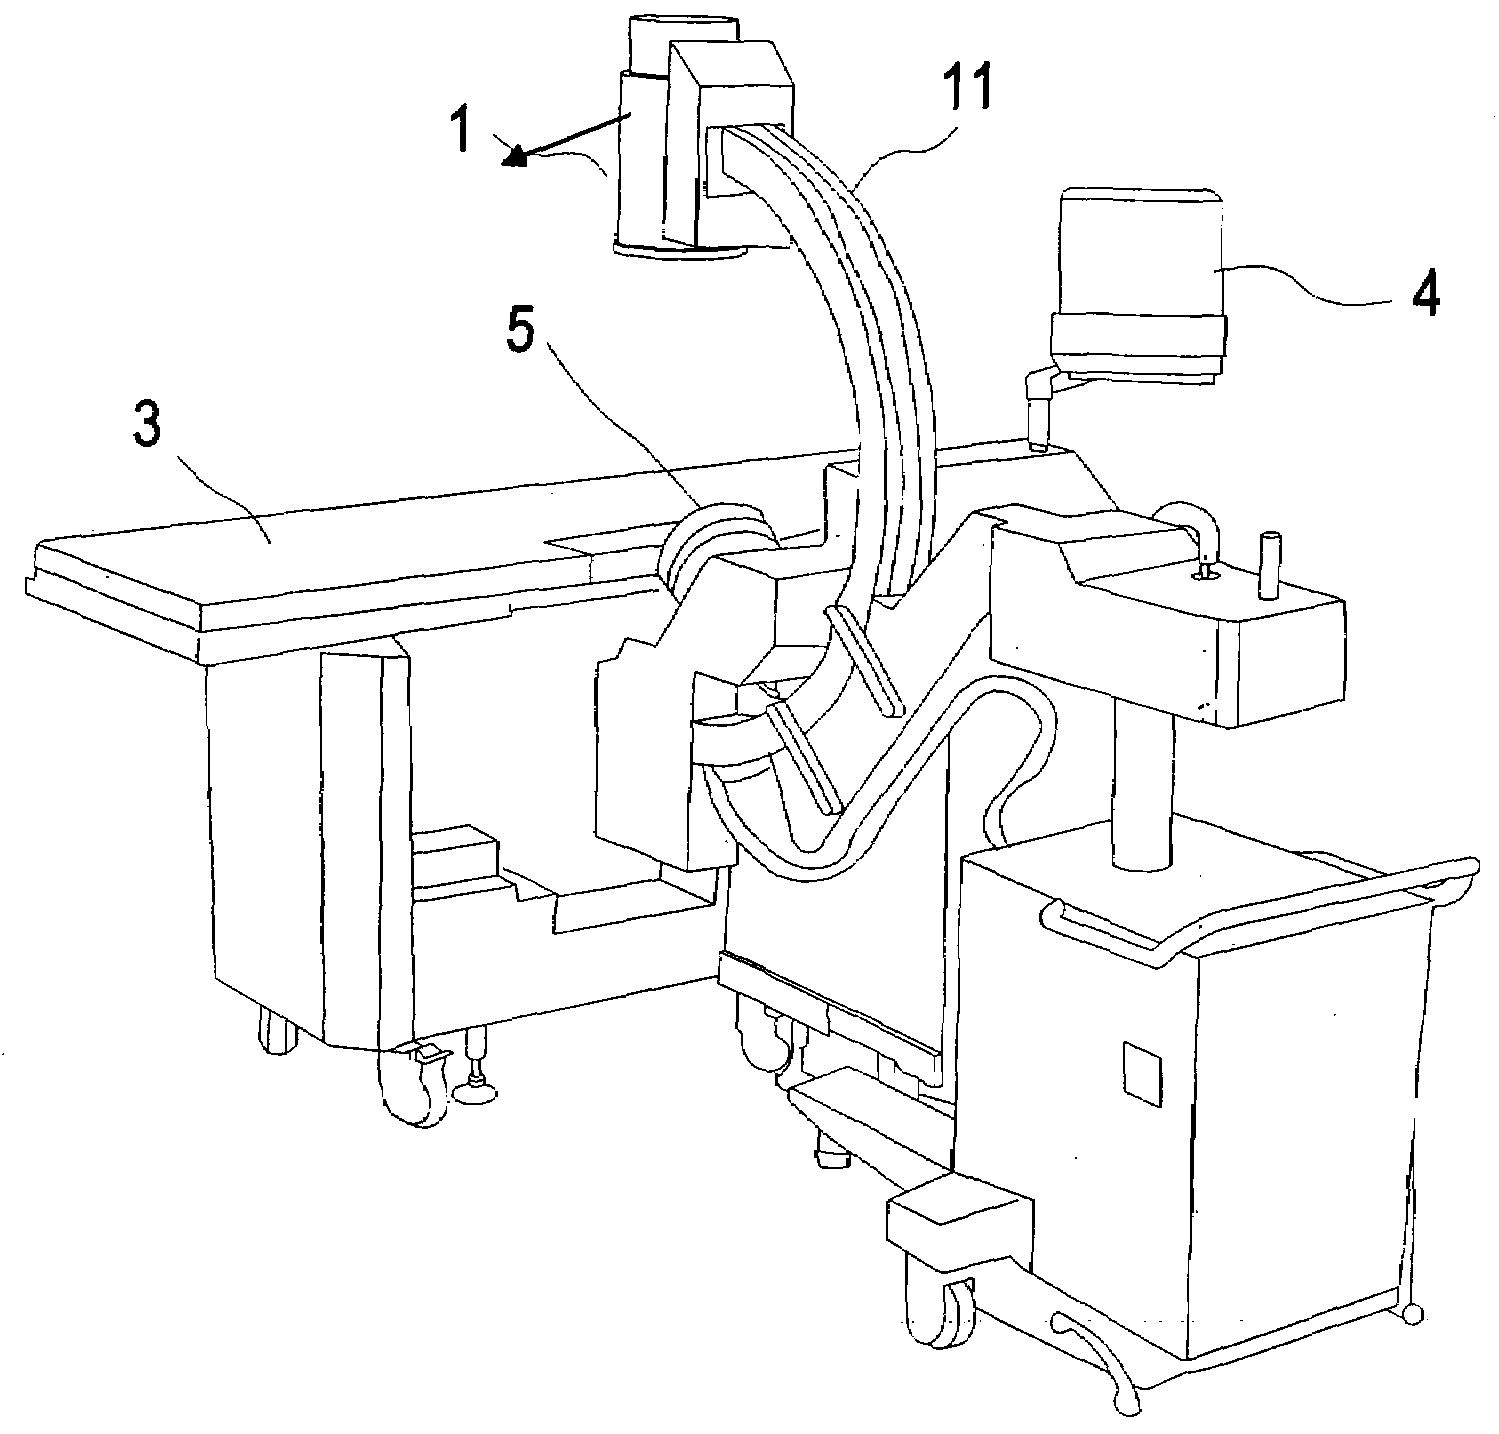 blok diagram x ray